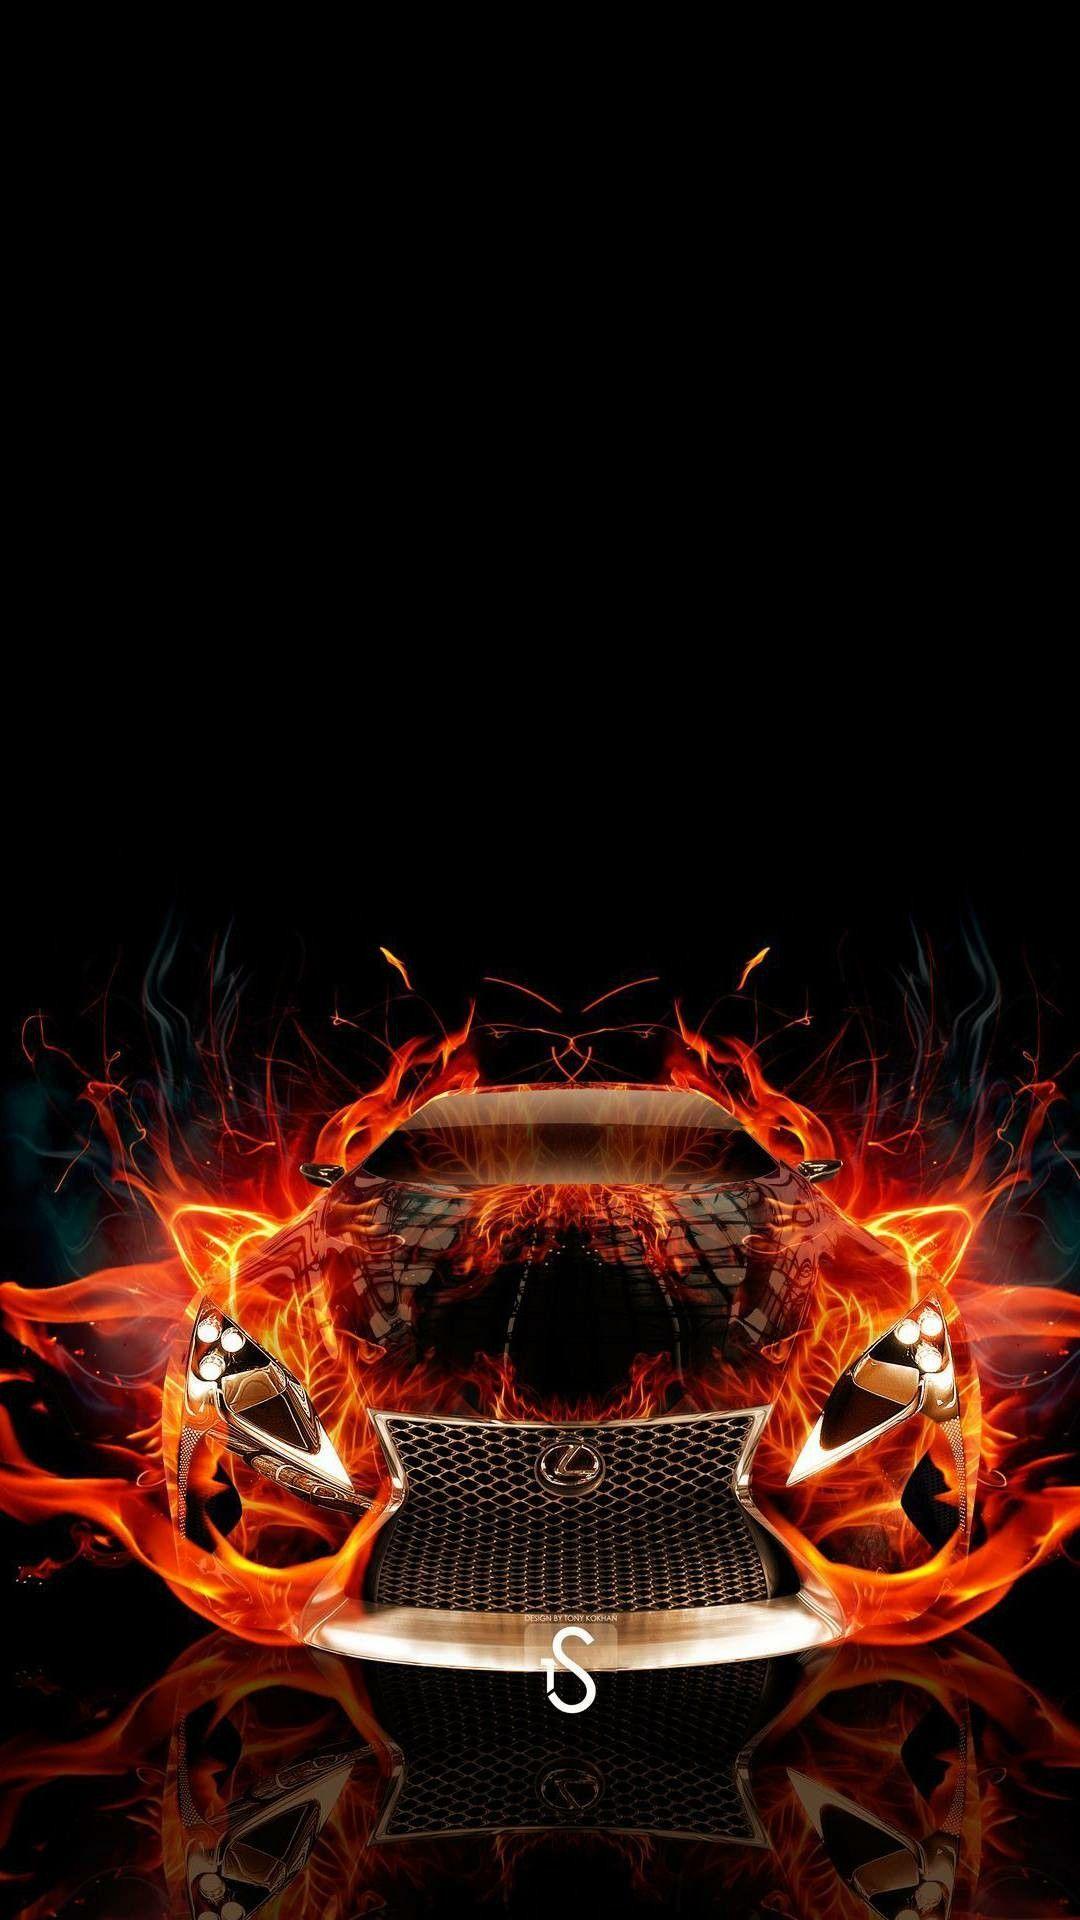 Fire Car Car Wallpapers Wallpaper Hd Phone Wallpapers